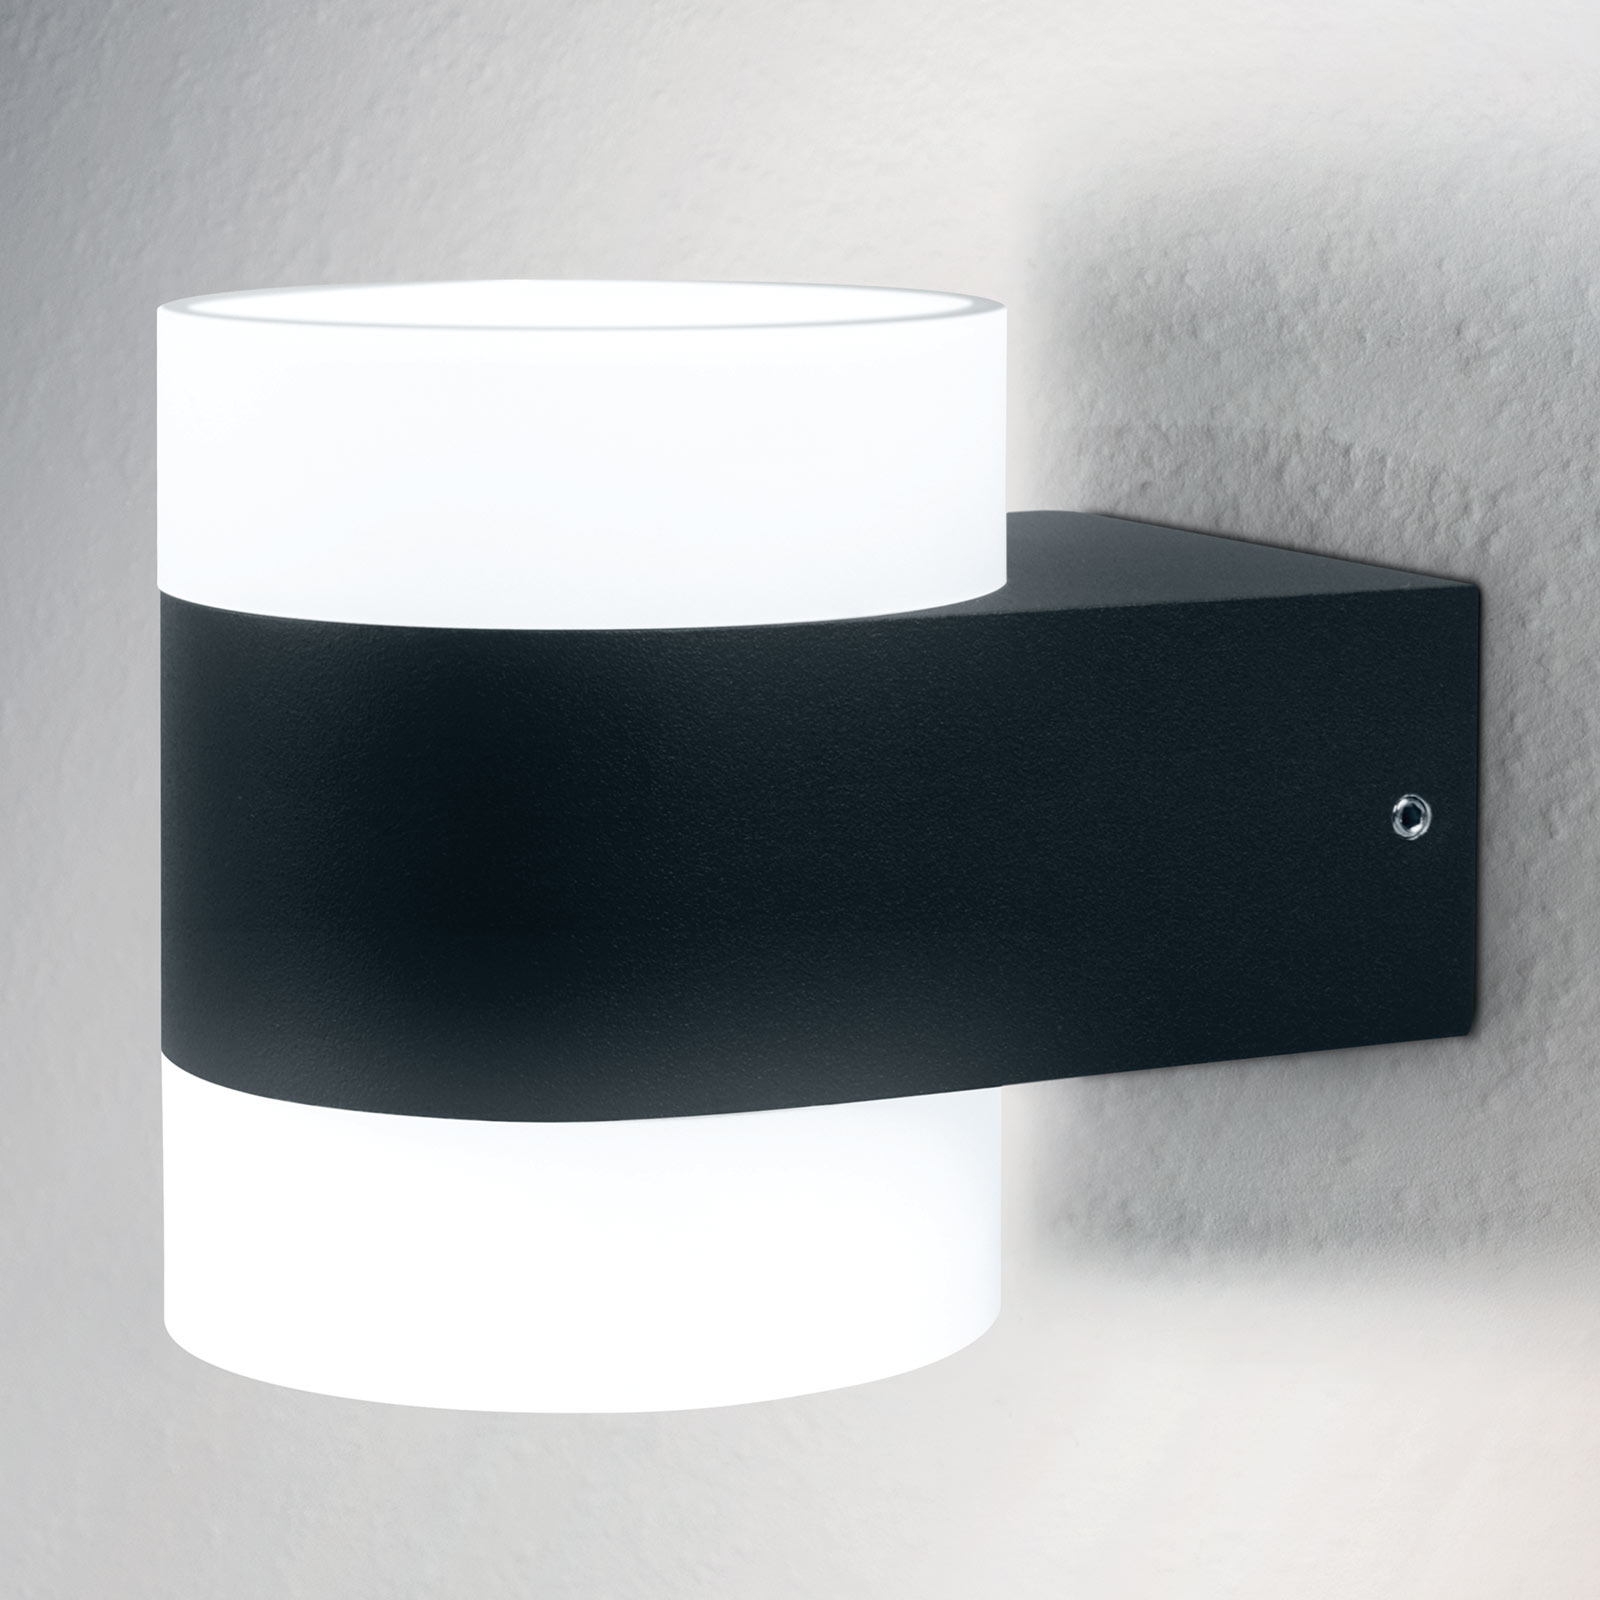 LEDVANCE Endura Style UpDown puck buitenwandlamp